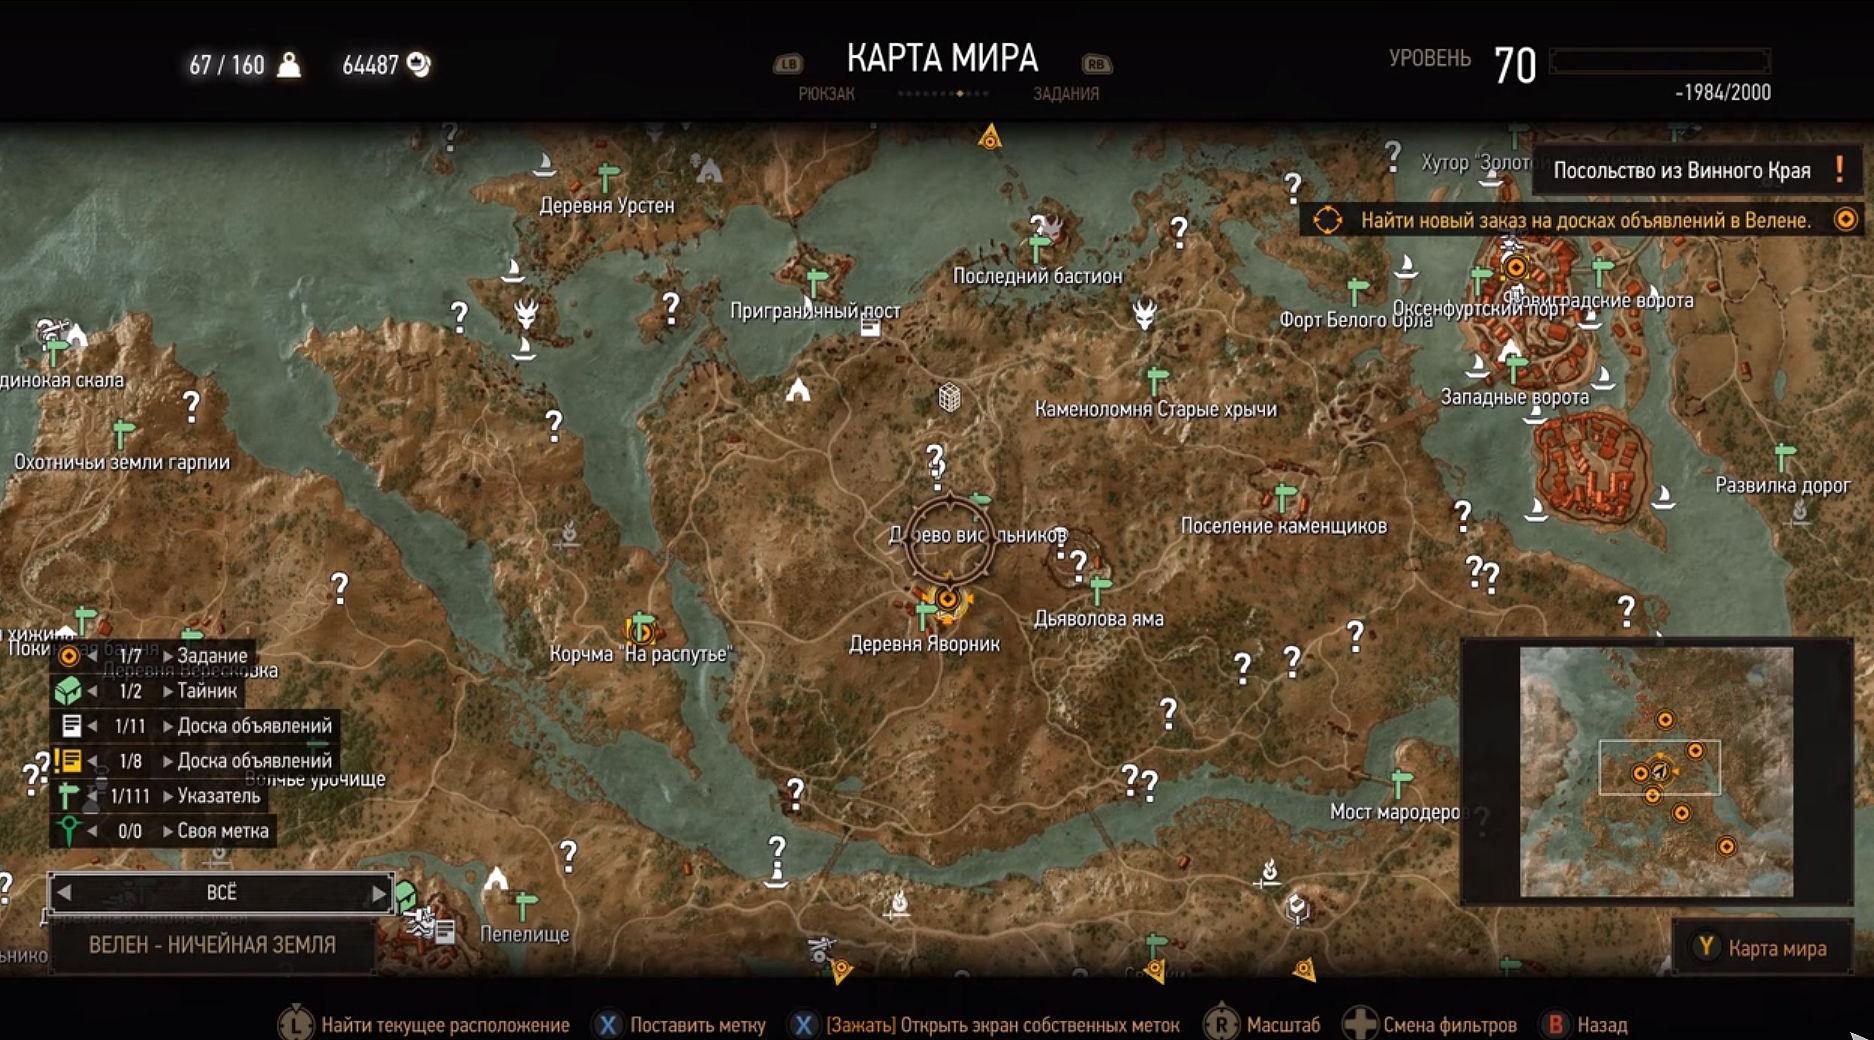 vedmak-3-dikaya-oxota-kak-nachat-dopolnenie-krov-i-vino-map_min